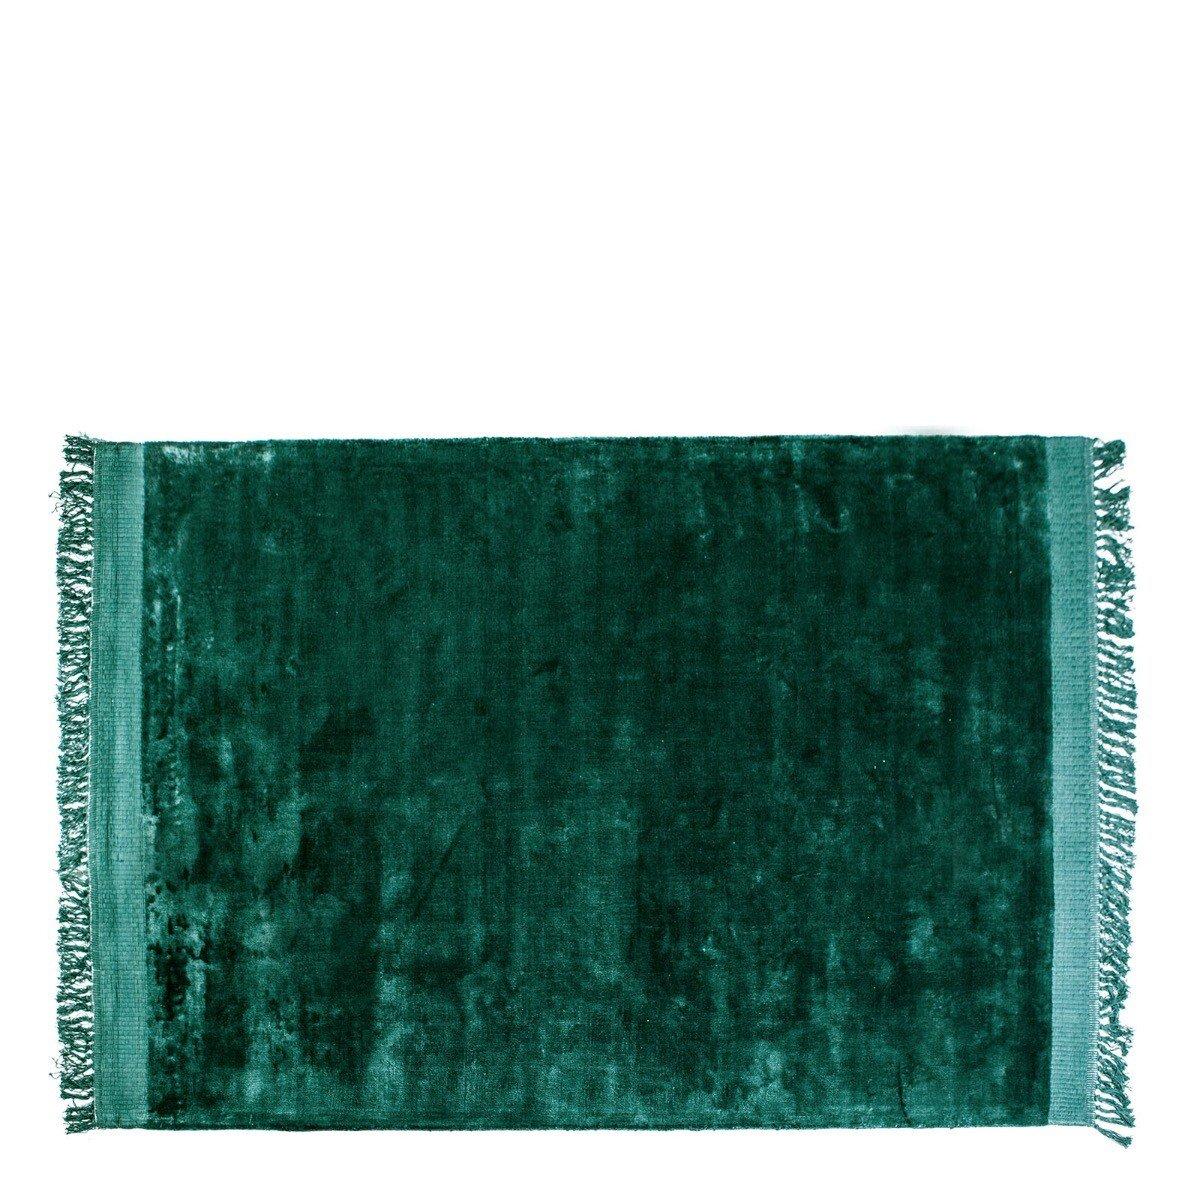 By Boo vloerkleed Peshi groen 230 x 160